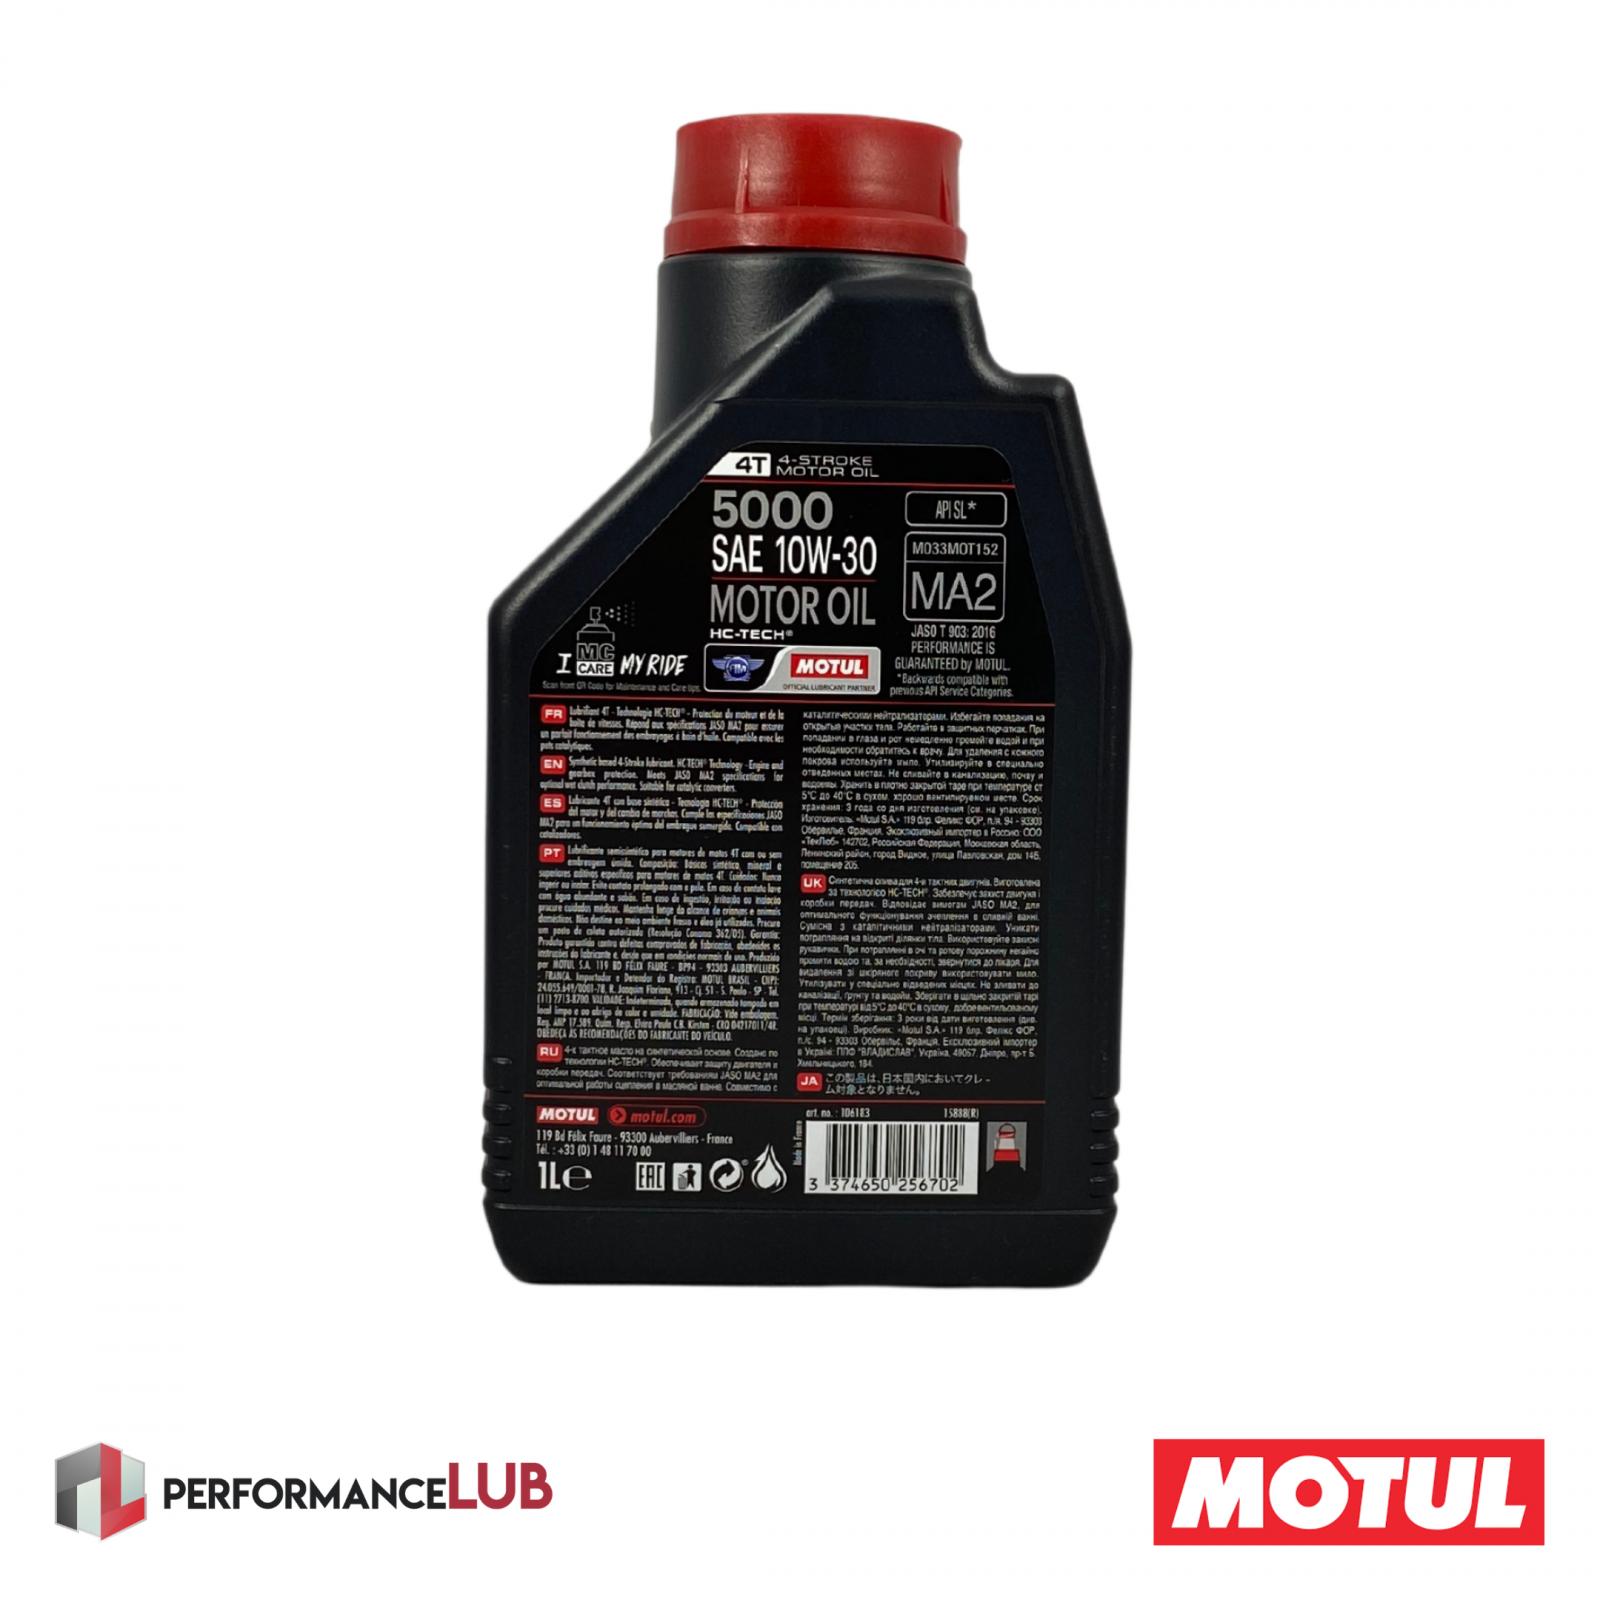 5000 4T 10W30 - JASO MA2 - 1 litro - PerformanceLUB Lubrificantes Premium